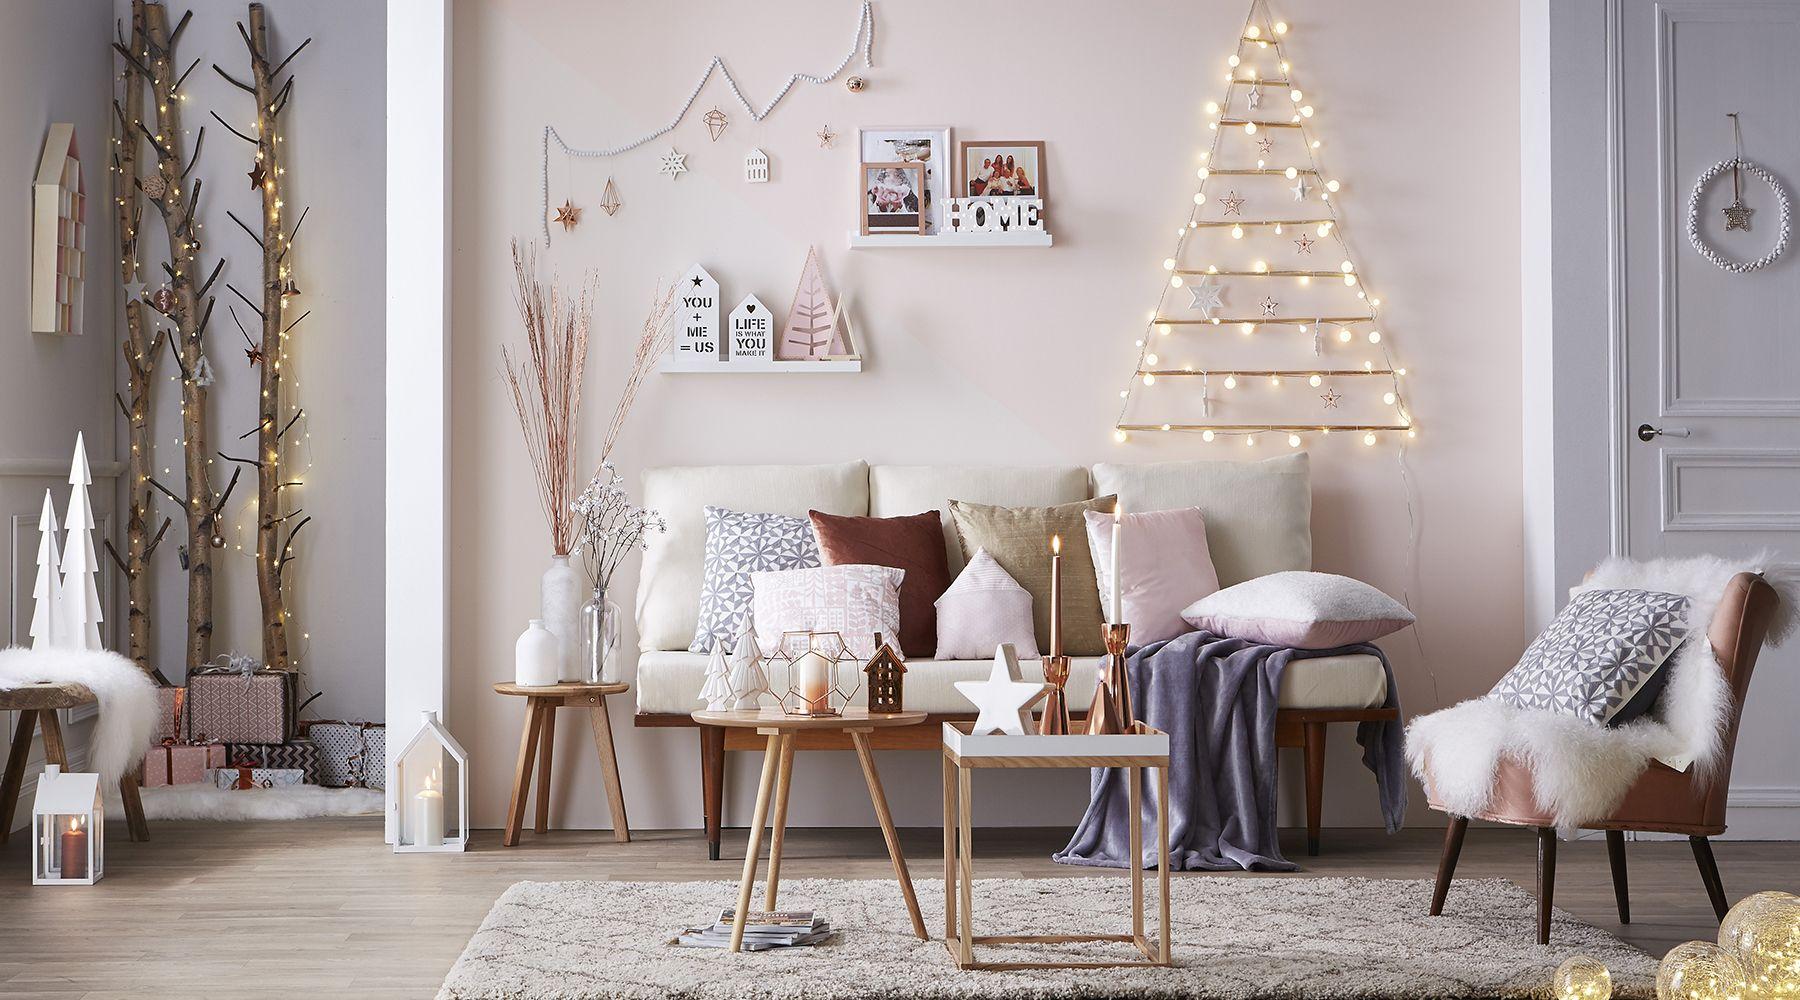 id e d co salon d clic no l nordique la pi ce vivre pinterest noel deco et idee deco. Black Bedroom Furniture Sets. Home Design Ideas